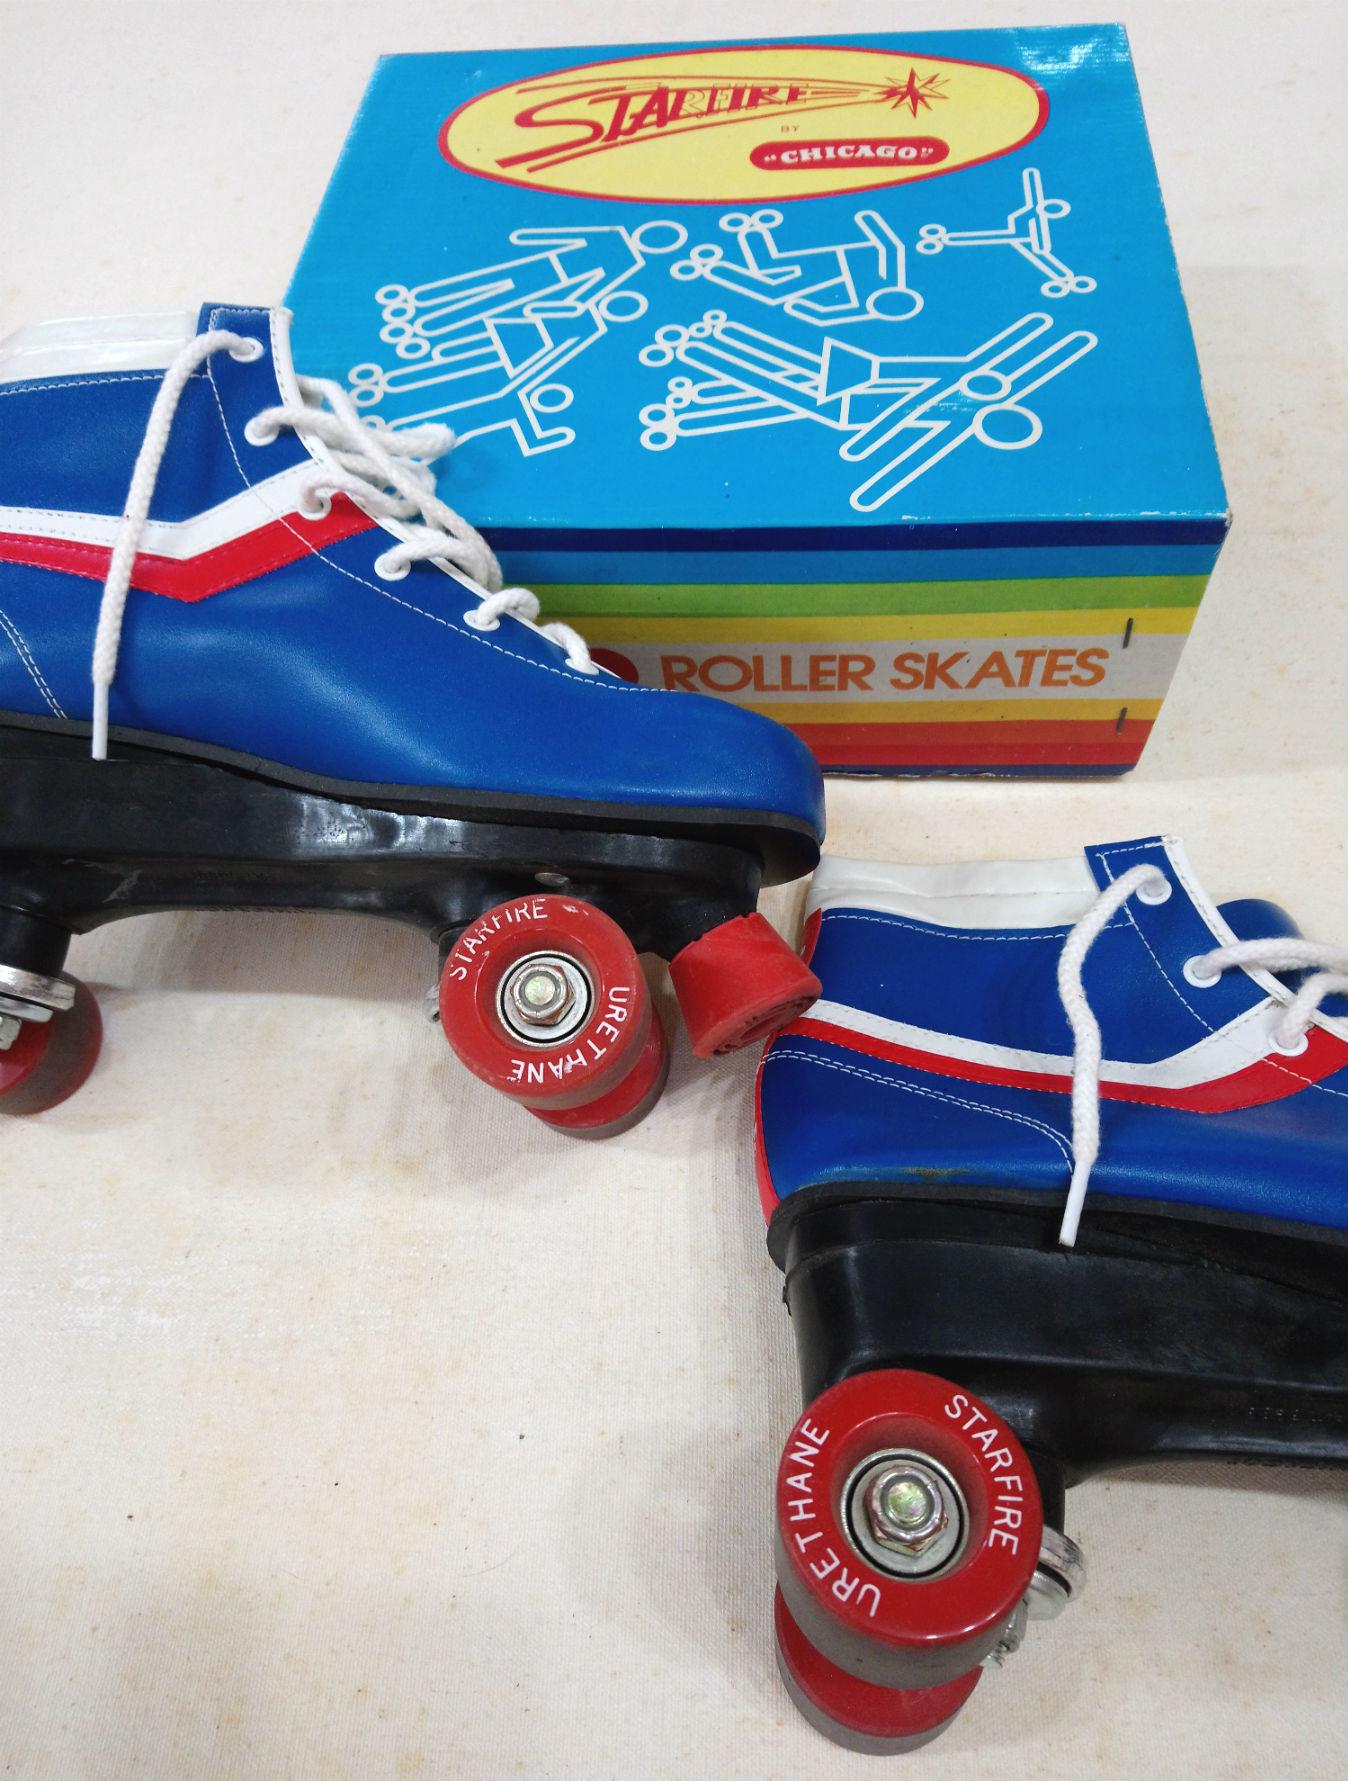 Vintage Starfire Chicago Roller Skates